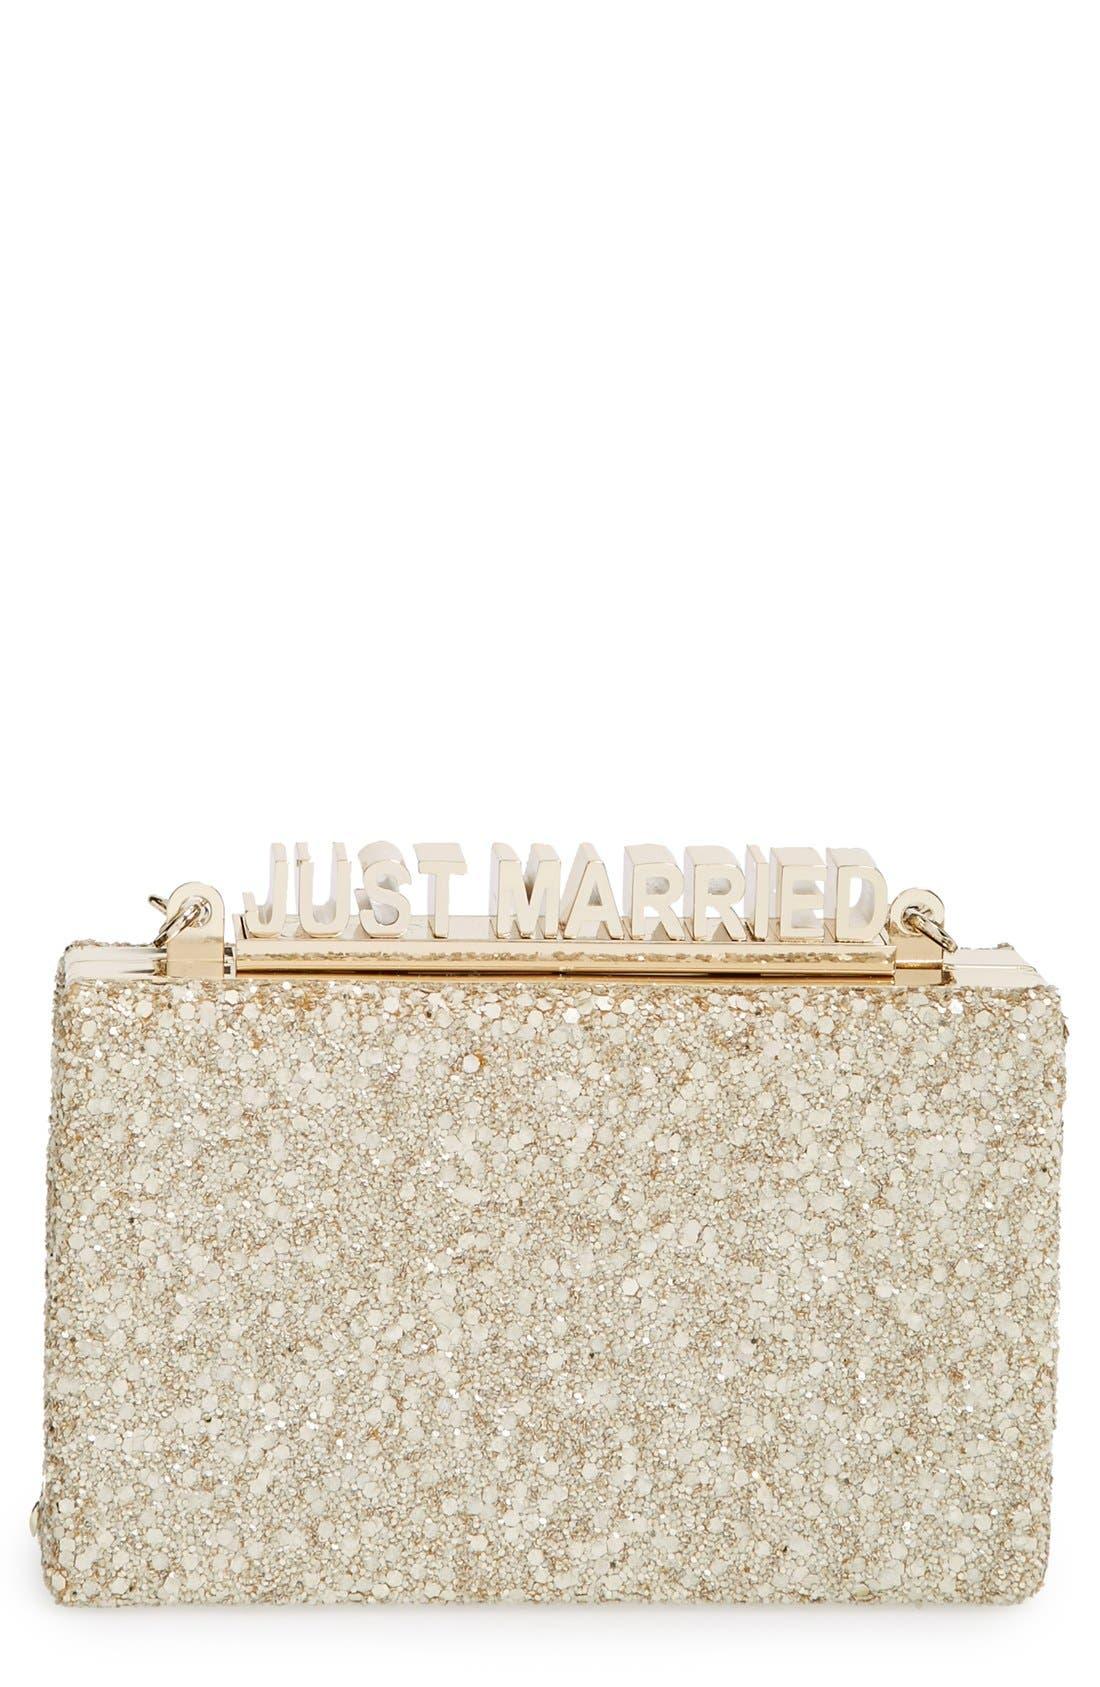 Alternate Image 1 Selected - kate spade new york 'wedding belles - ravi' box clutch